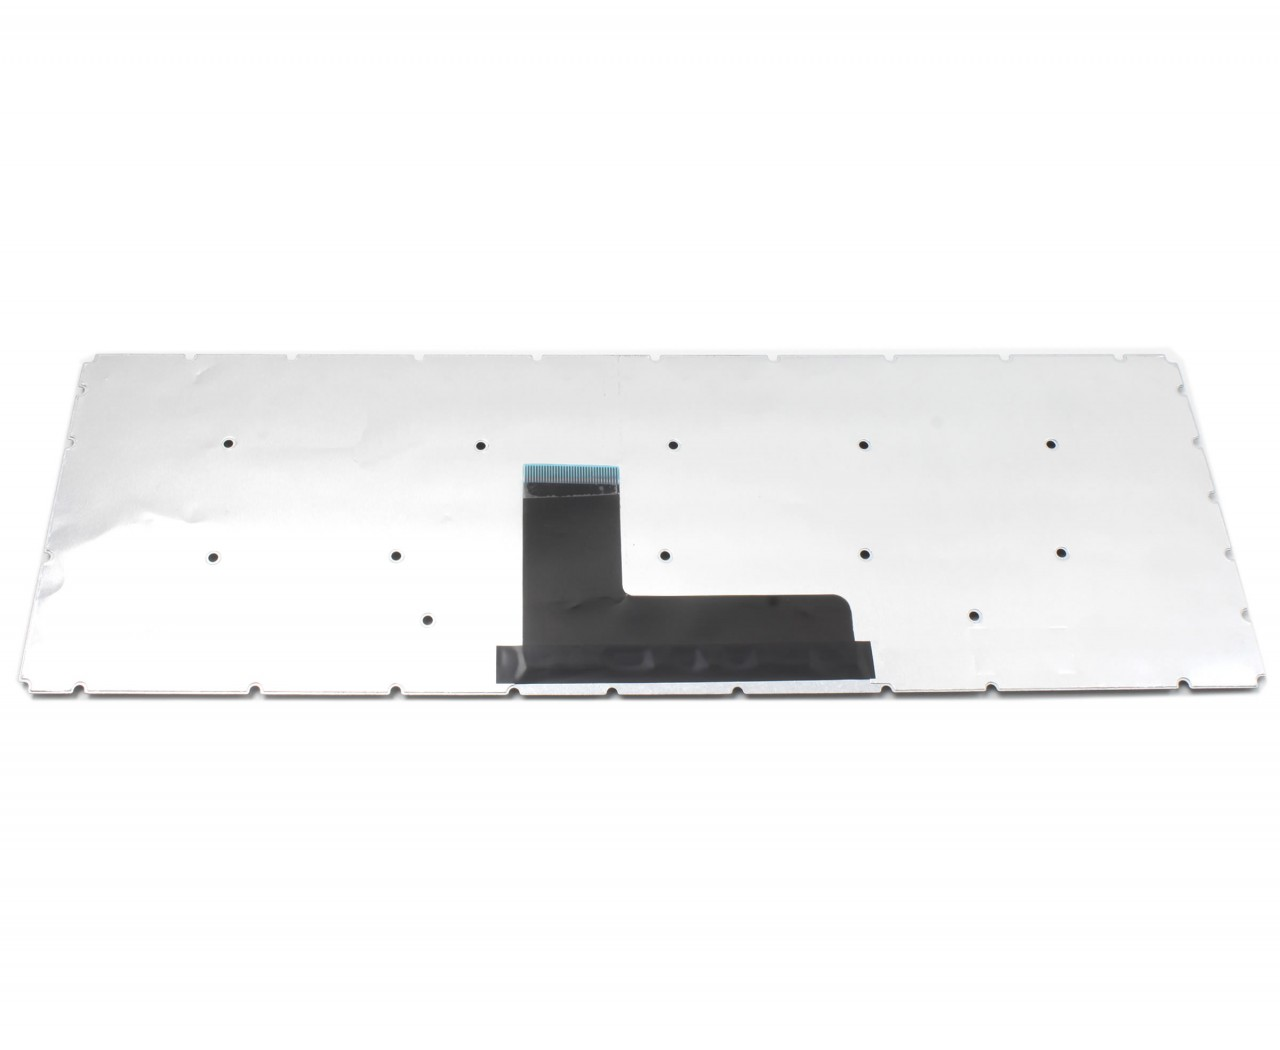 Tastatura Toshiba Satellite L55DT B layout US fara rama enter mic imagine powerlaptop.ro 2021